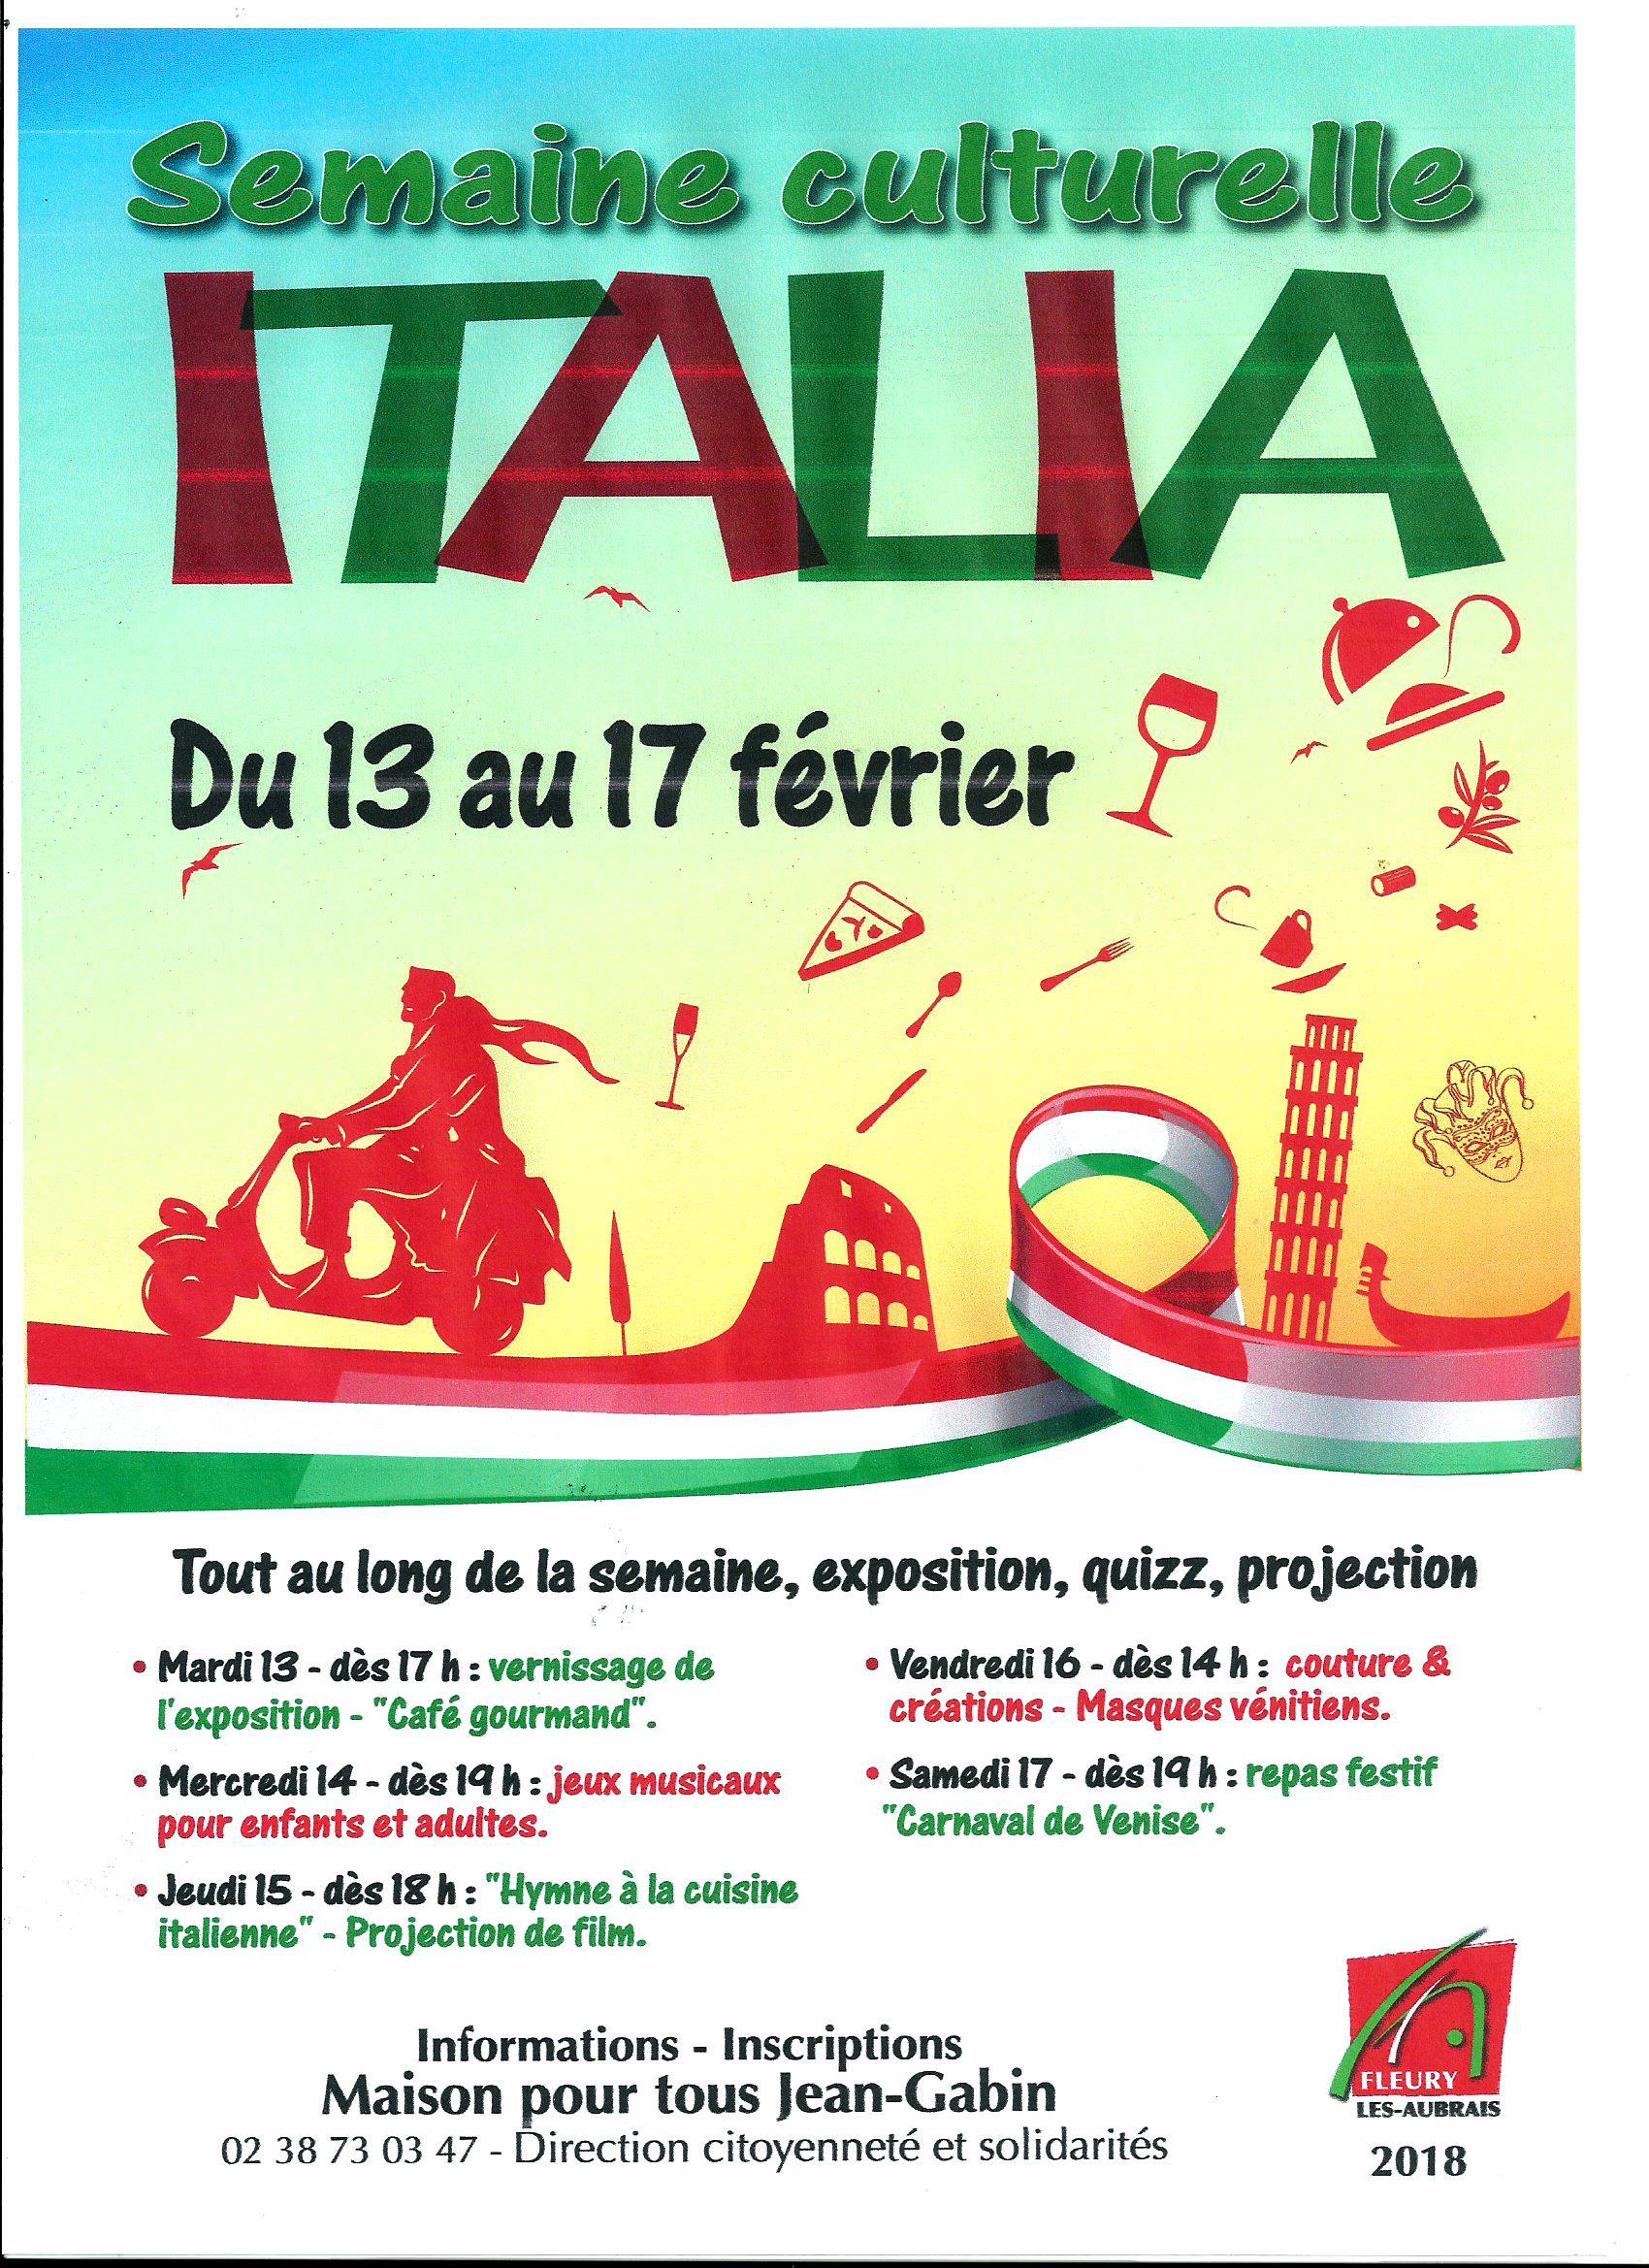 Scan Semaine culturelle ITALIA 2018 ( du 13 au 17 février 2018 .jpg